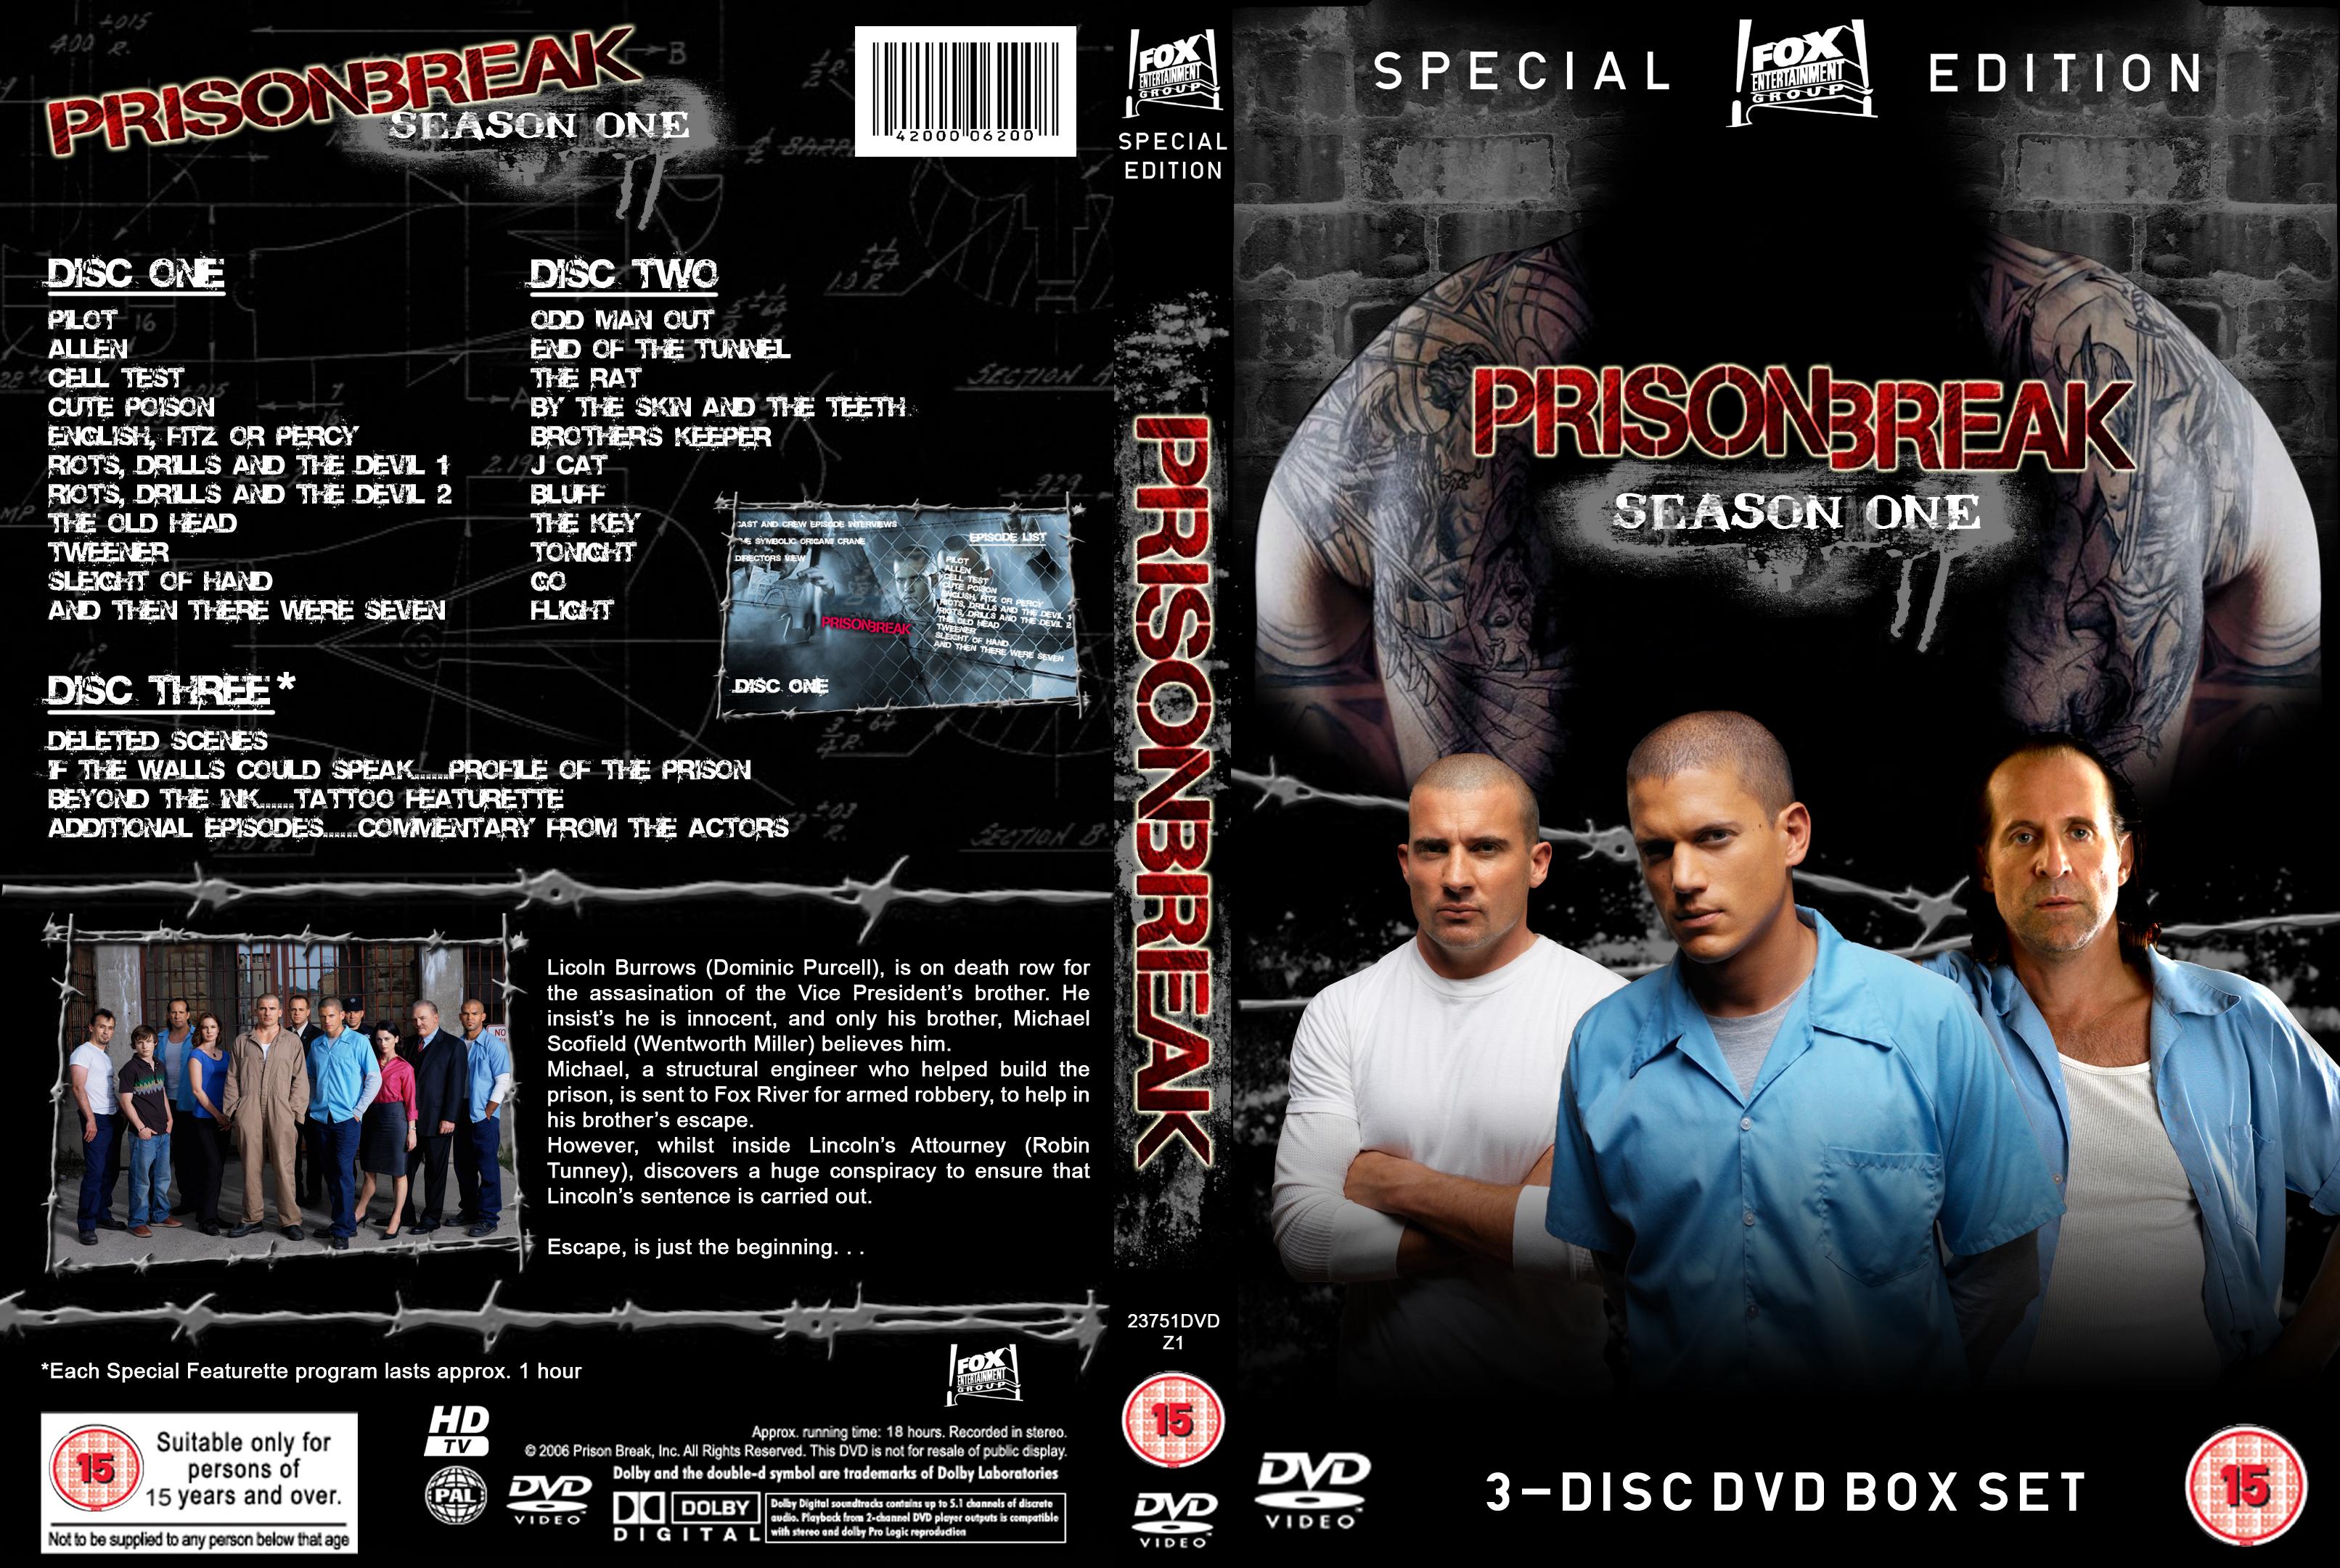 Prison Break Dvd Cover By Adampalmer On Deviantart